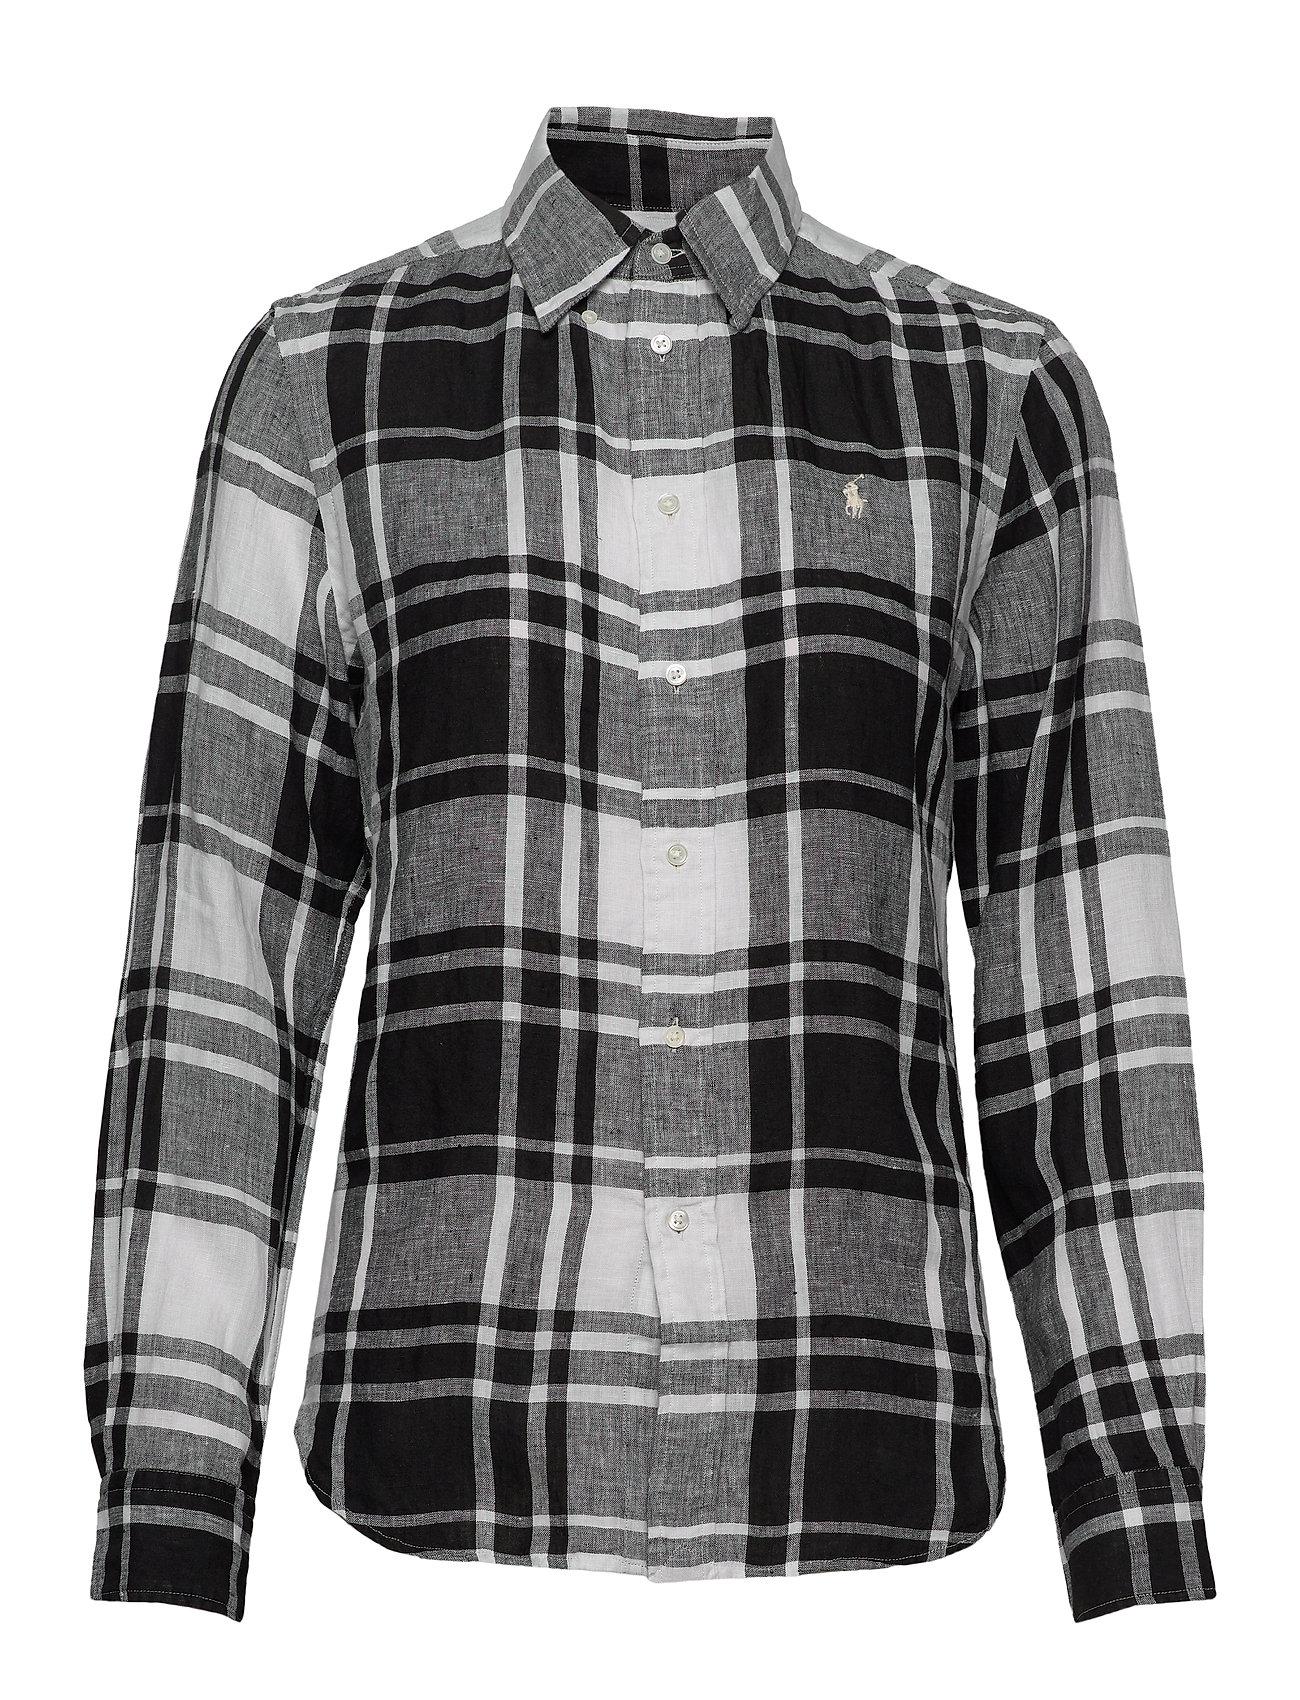 Polo Ralph Lauren Plaid Linen Button-Down Shirt - 713 WHITE/BLACK